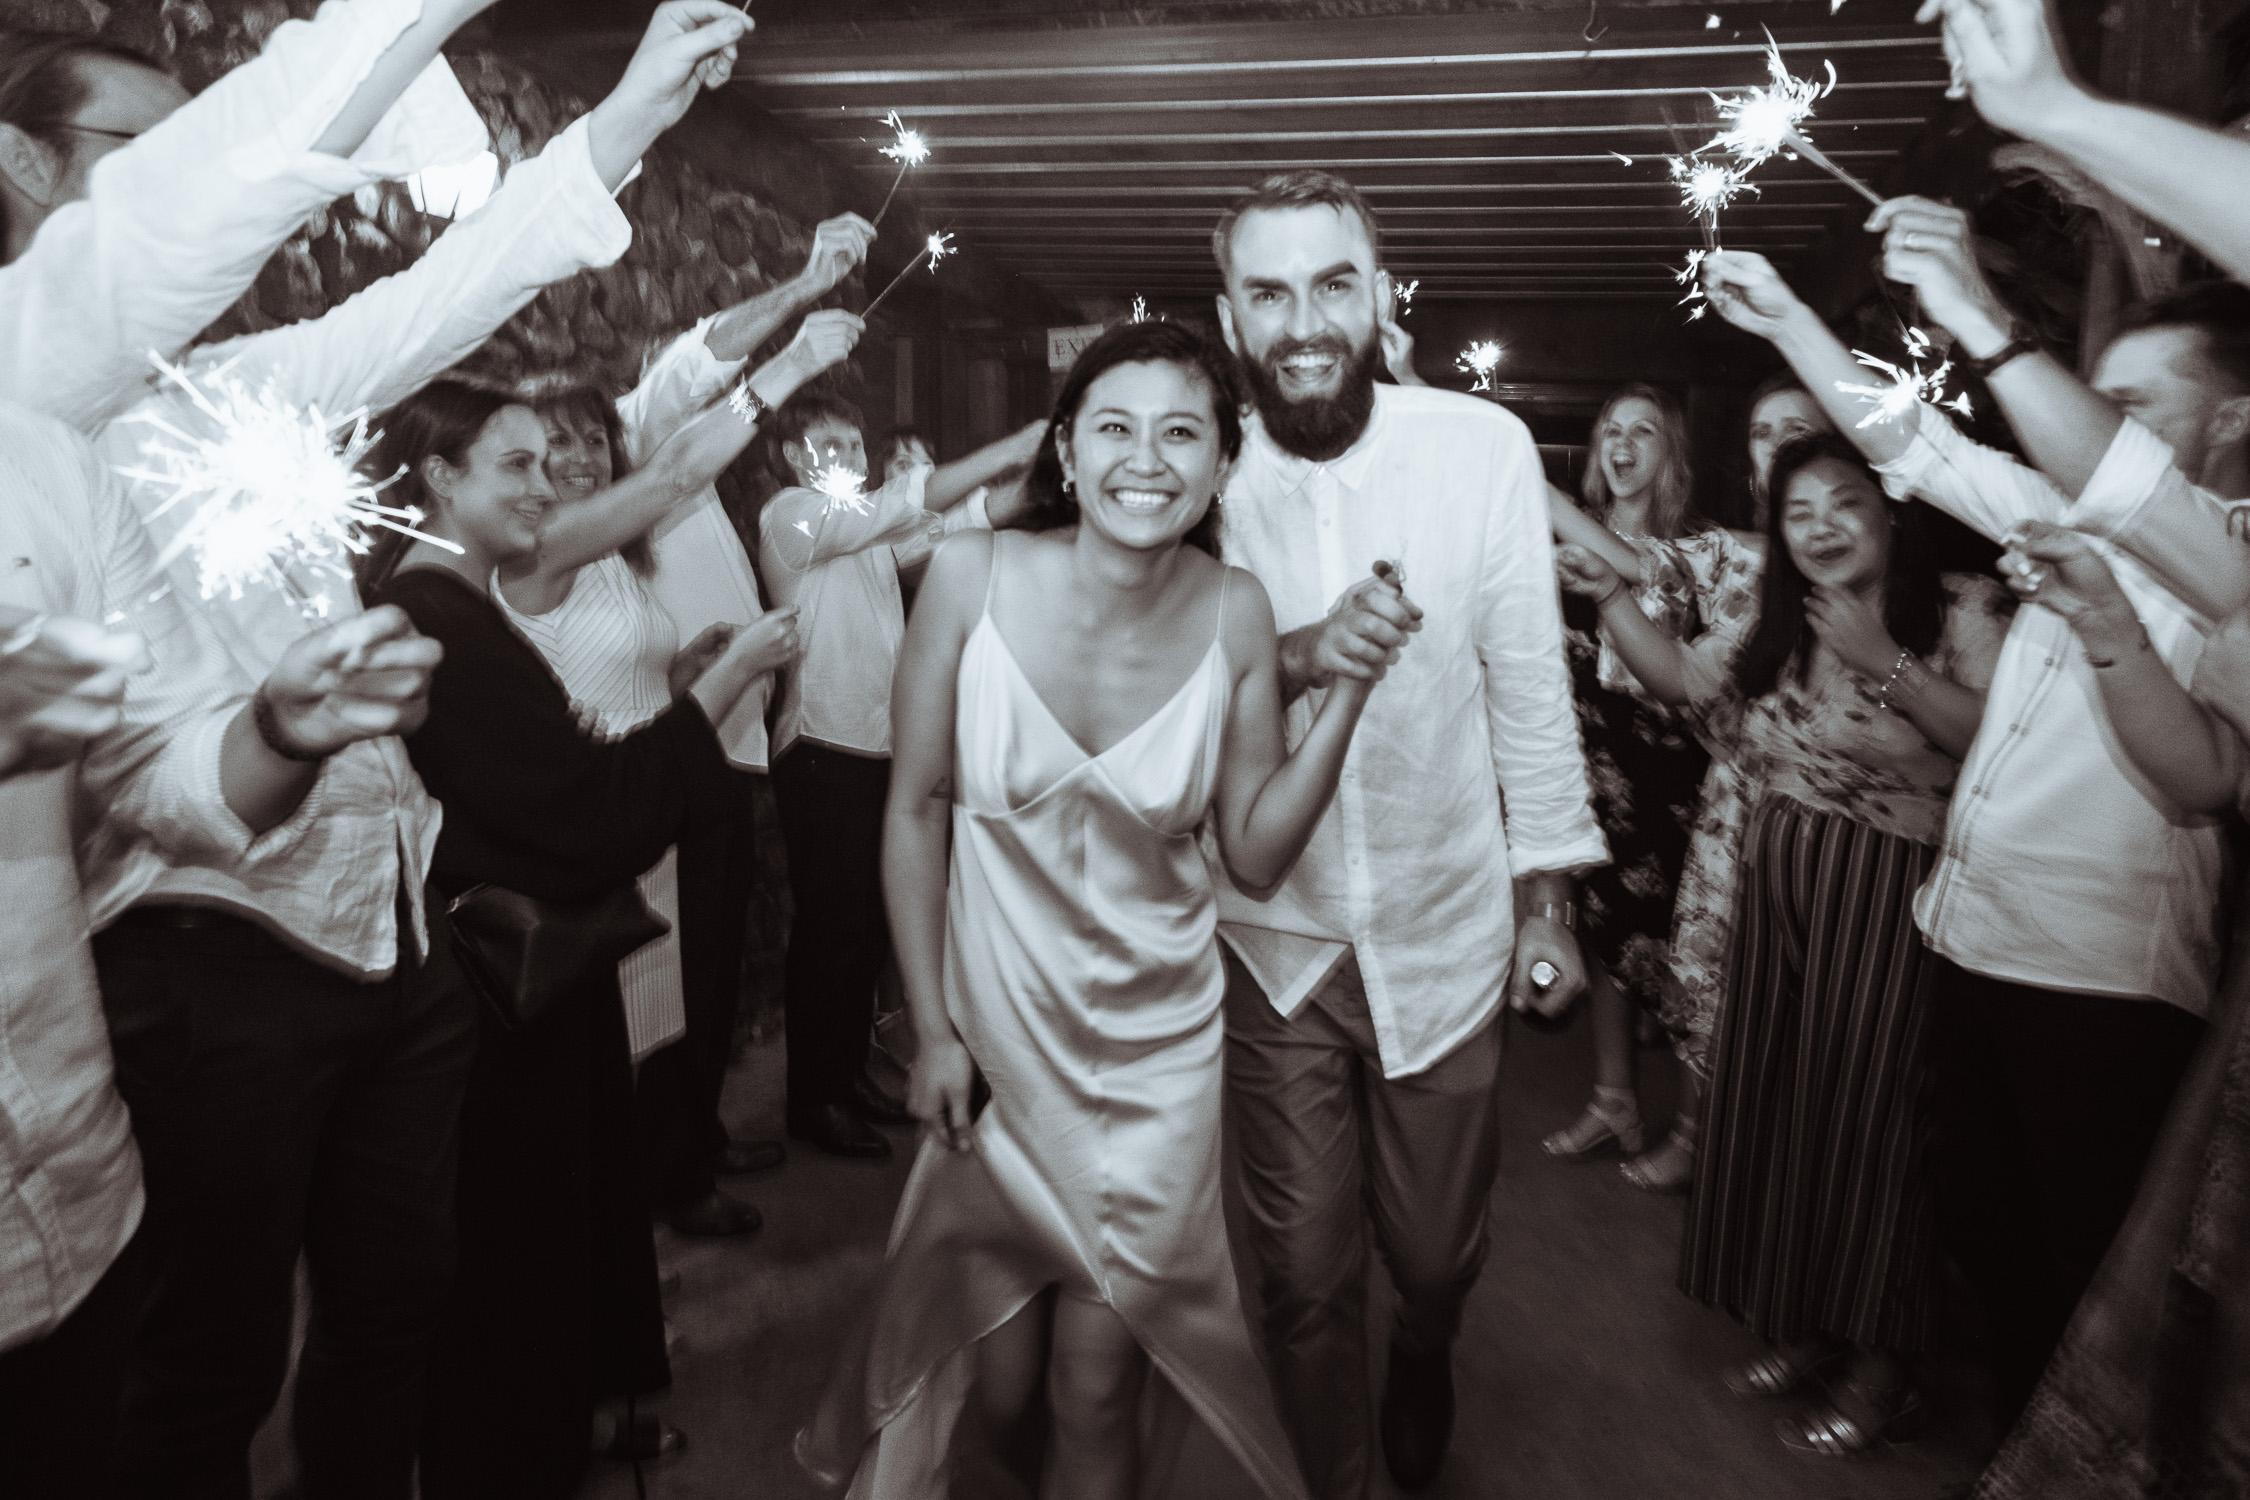 Melbourne Sunnystones Camp Wedding - bride and groom sparkler exit